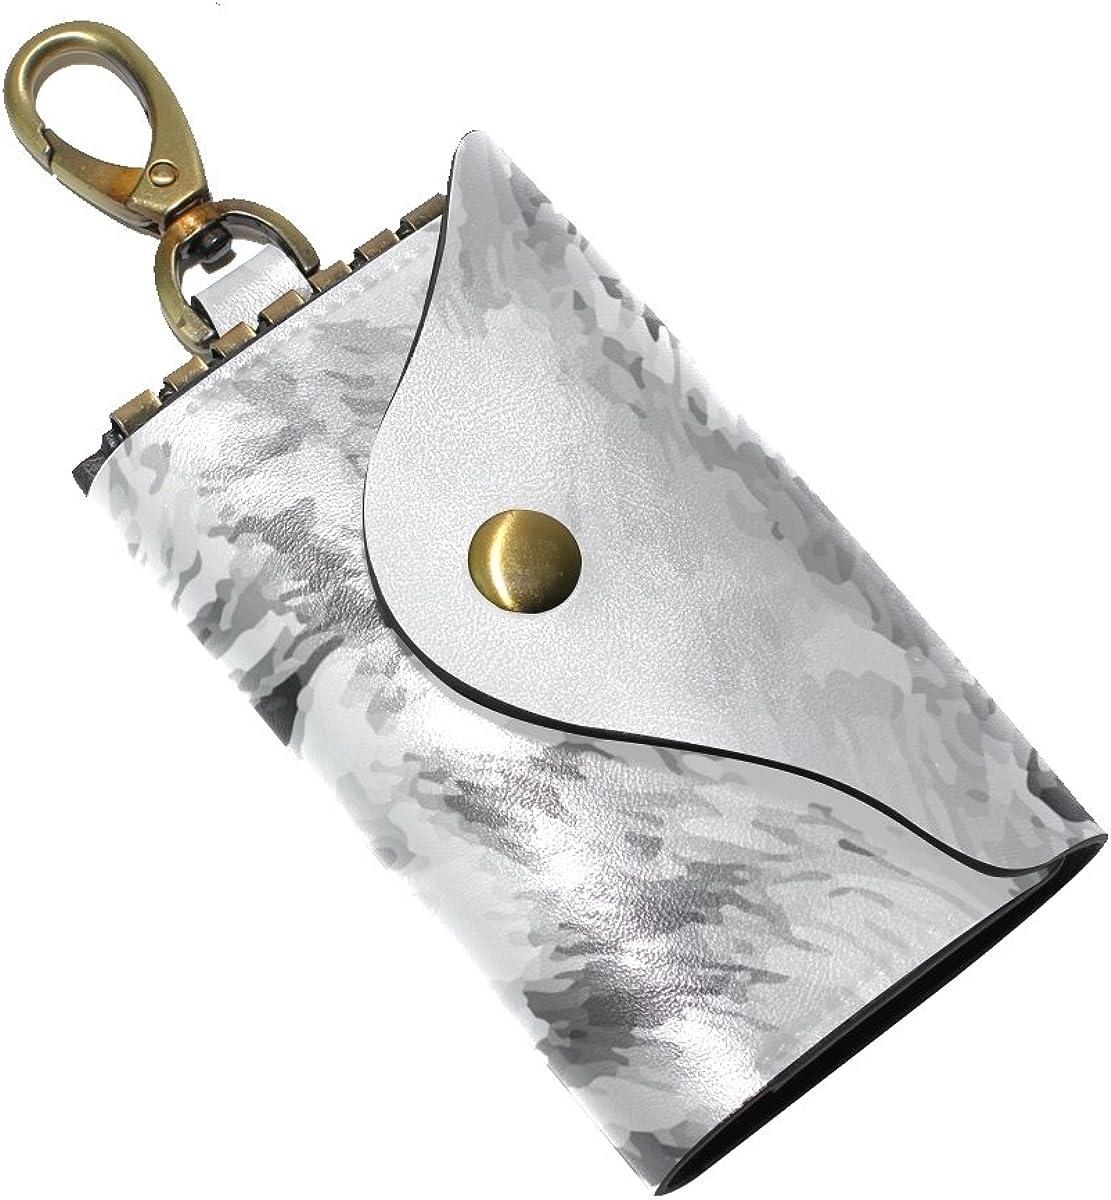 KEAKIA Hand Draw Fox Leather Key Case Wallets Tri-fold Key Holder Keychains with 6 Hooks 2 Slot Snap Closure for Men Women